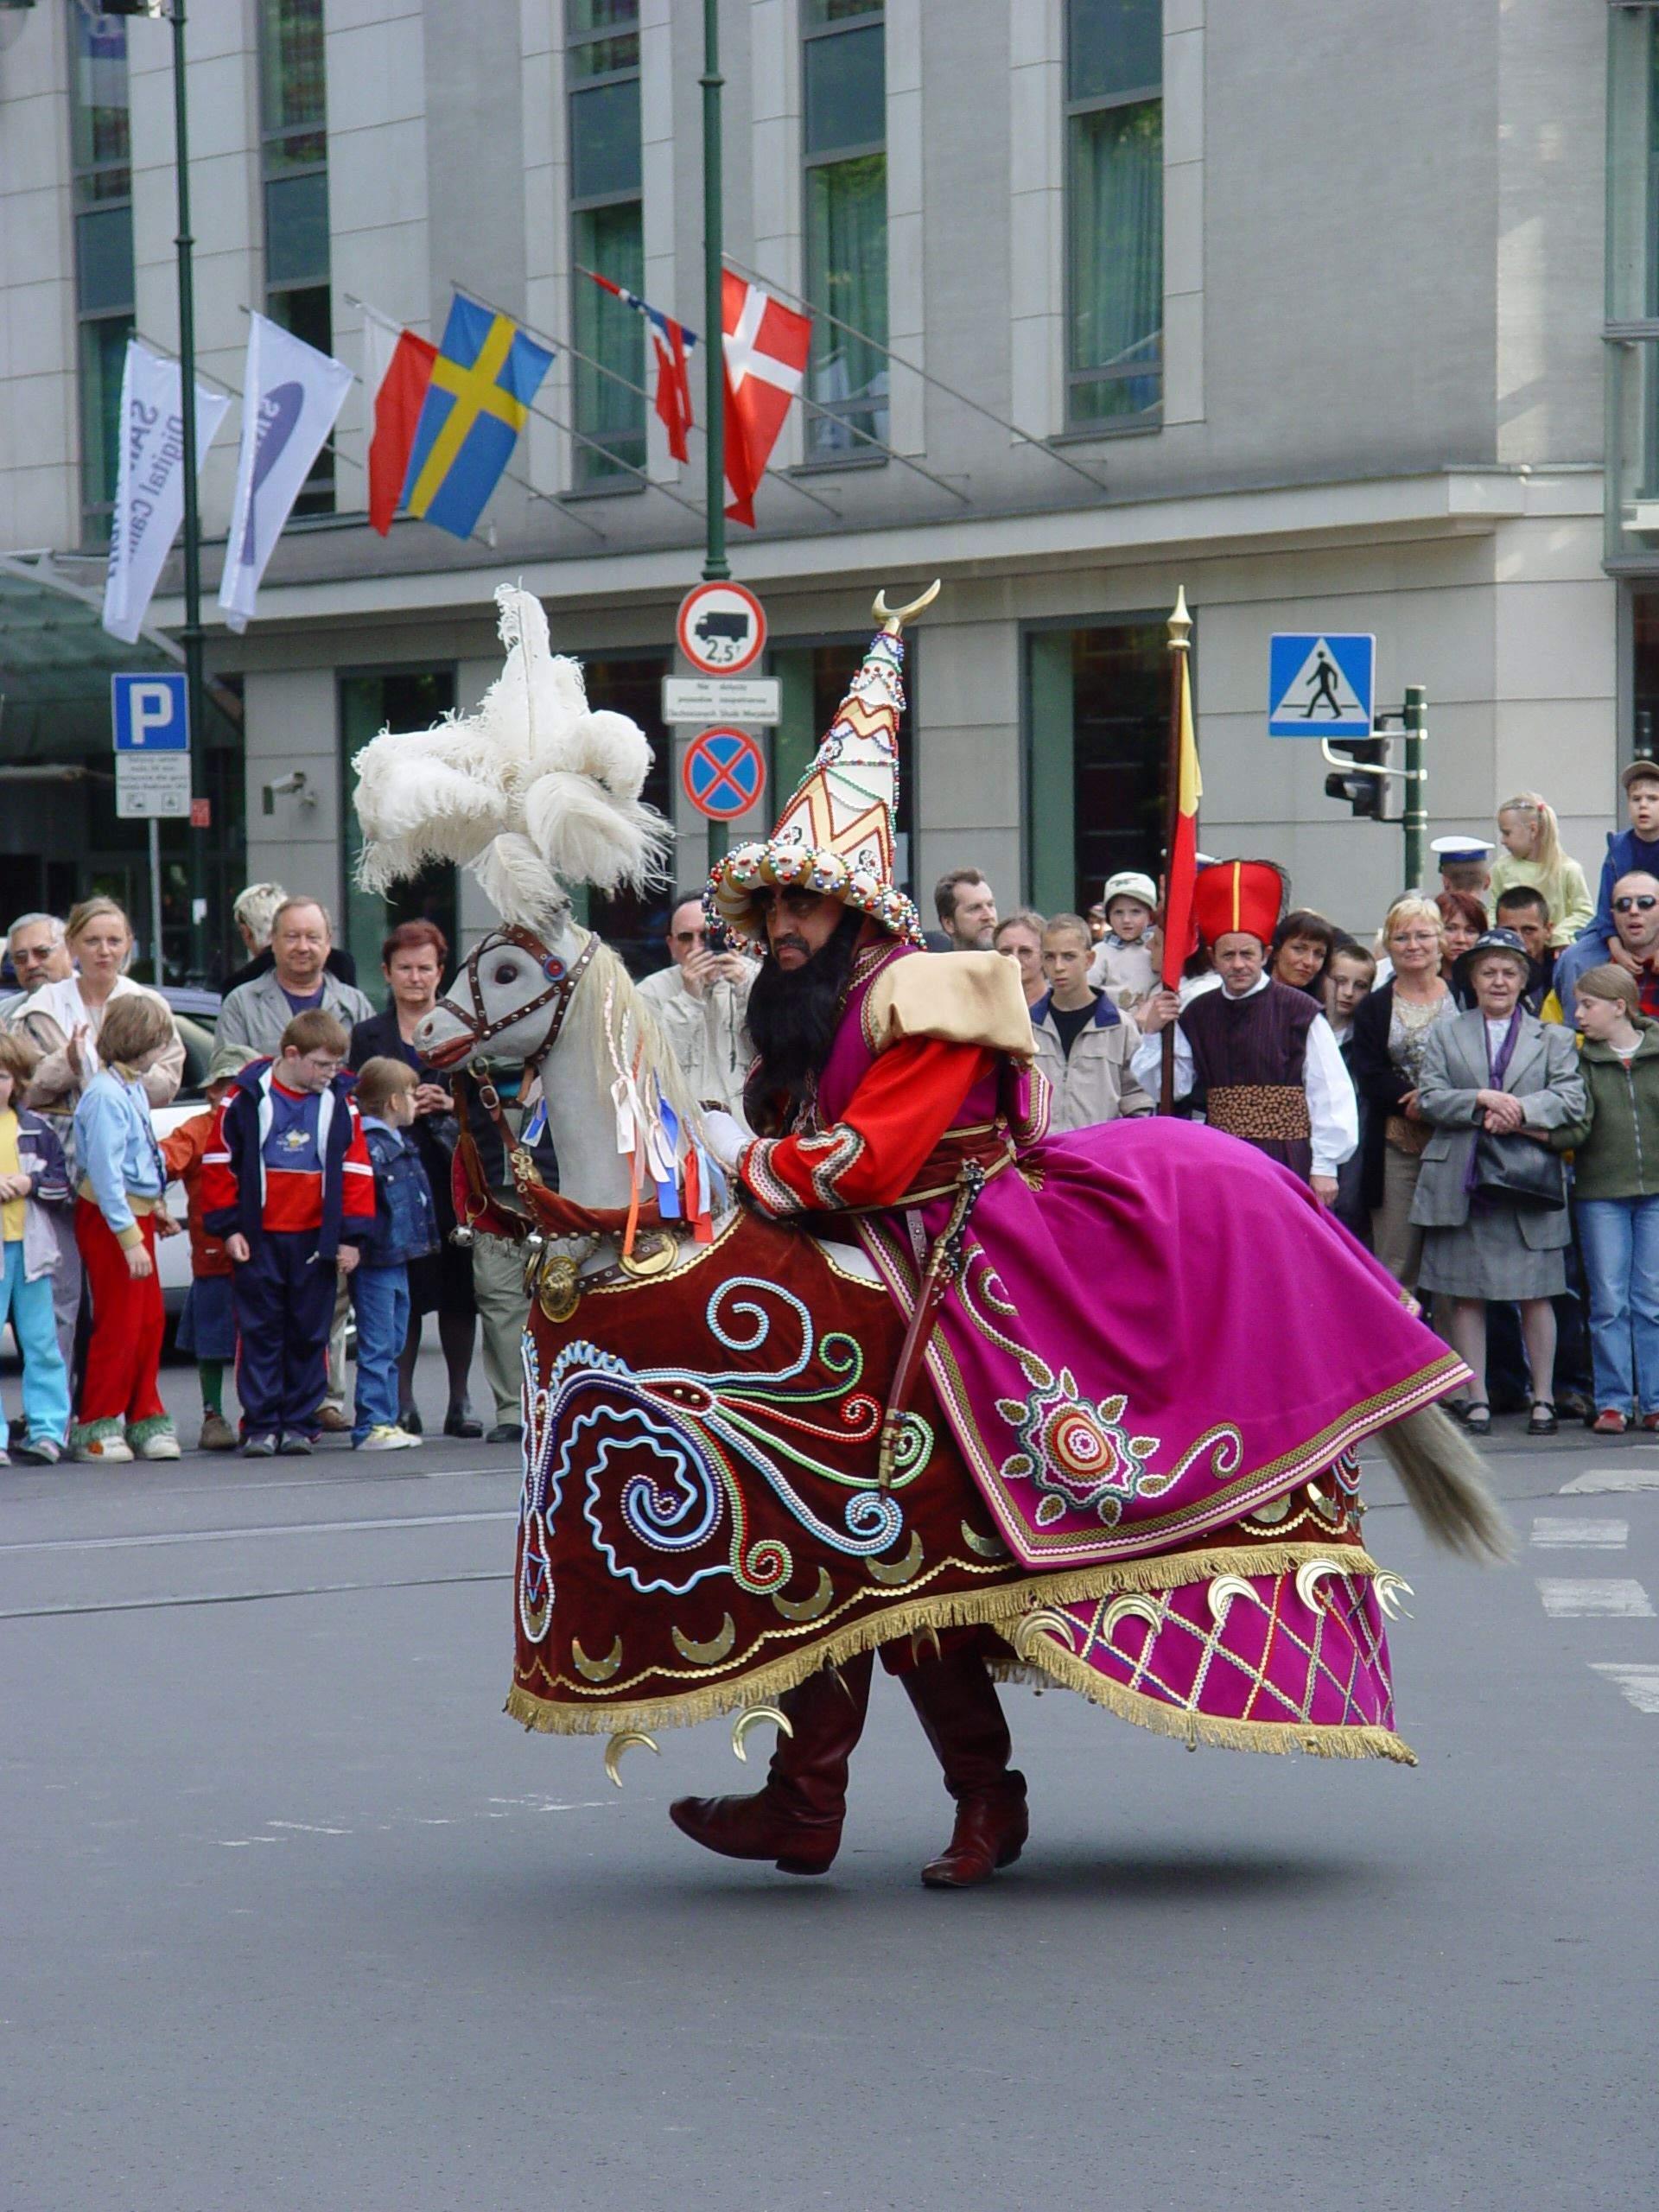 Kết quả hình ảnh cho lajkonik festival